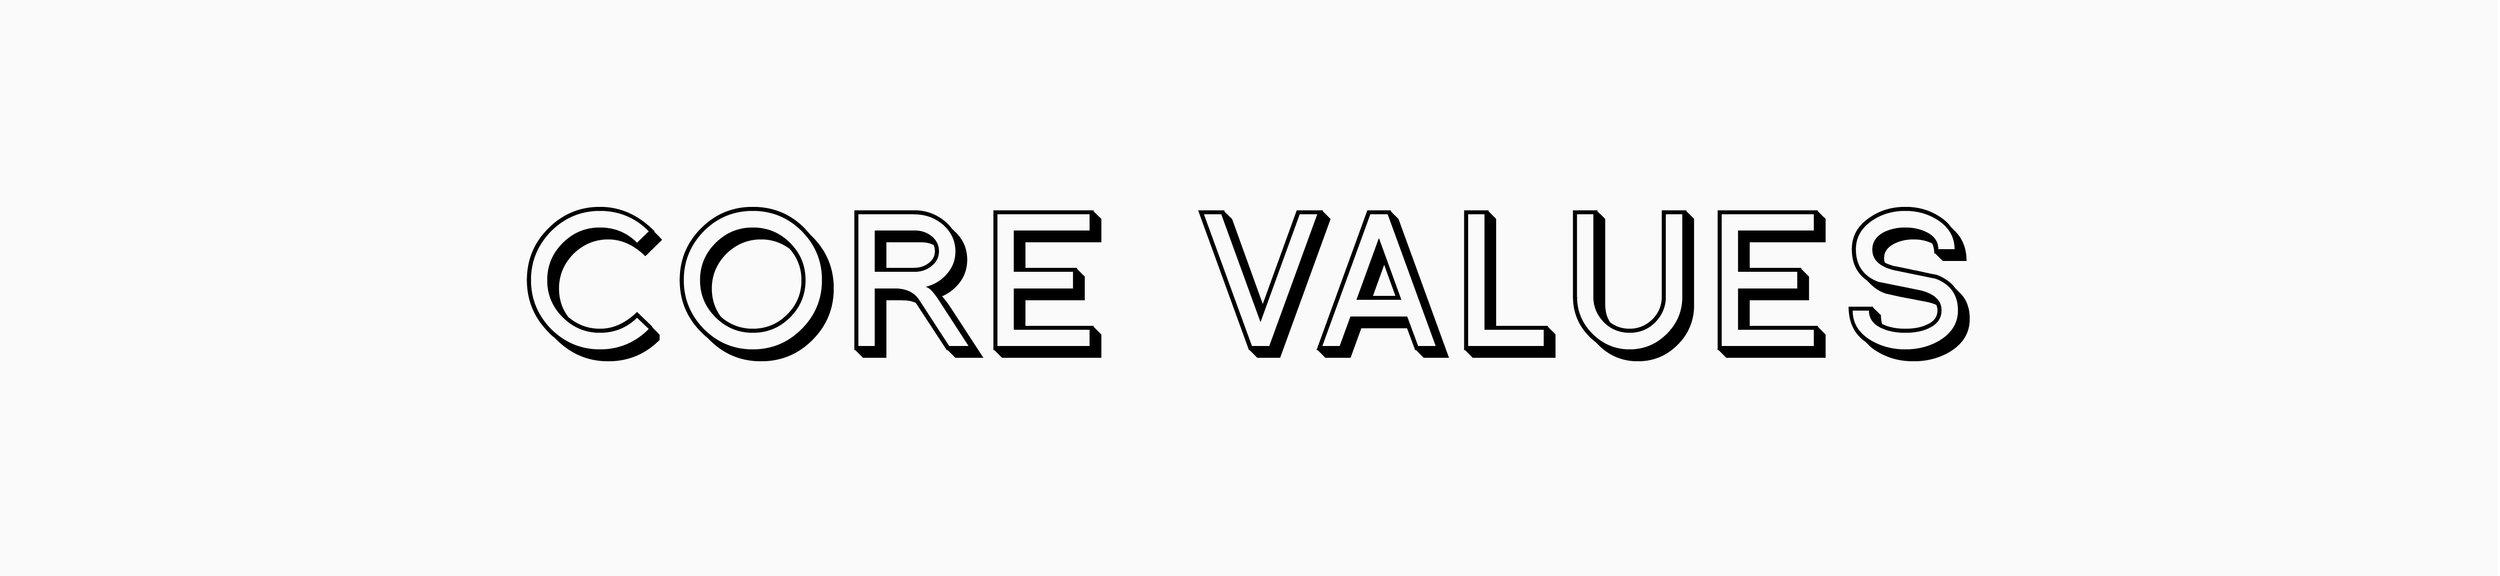 CORE VALUES-18.jpg